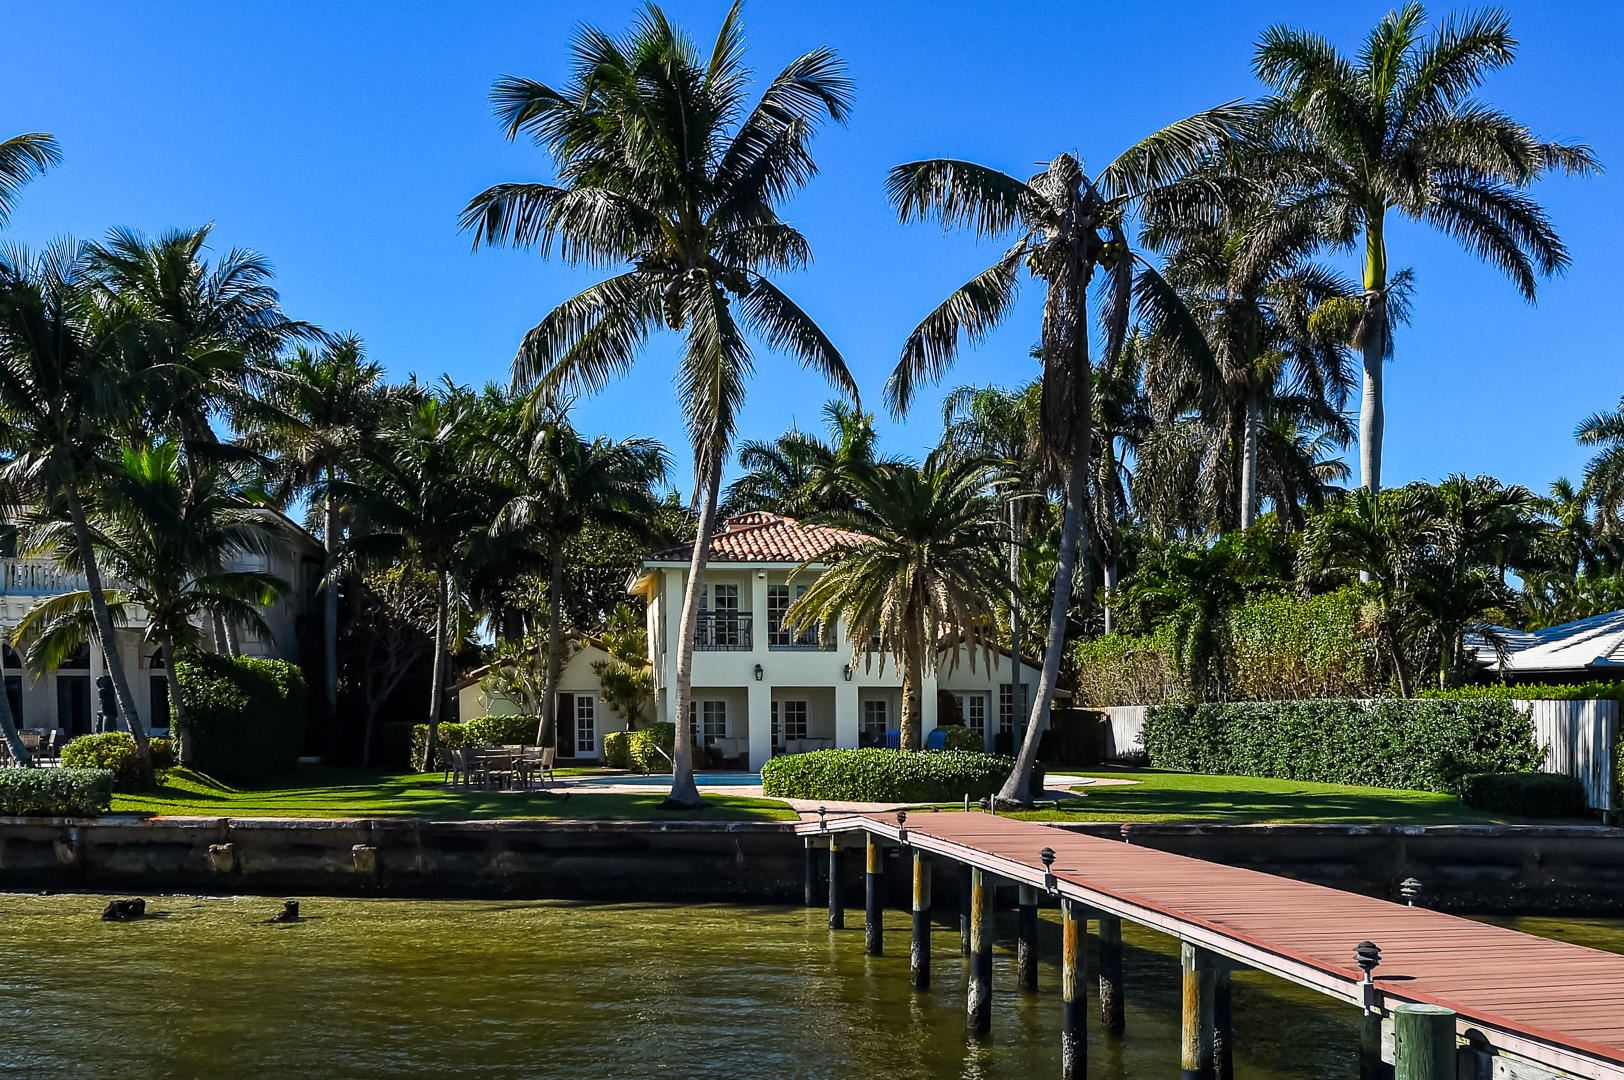 3304 N Flagler Drive, West Palm Beach, FL 33407 - #: RX-10673670